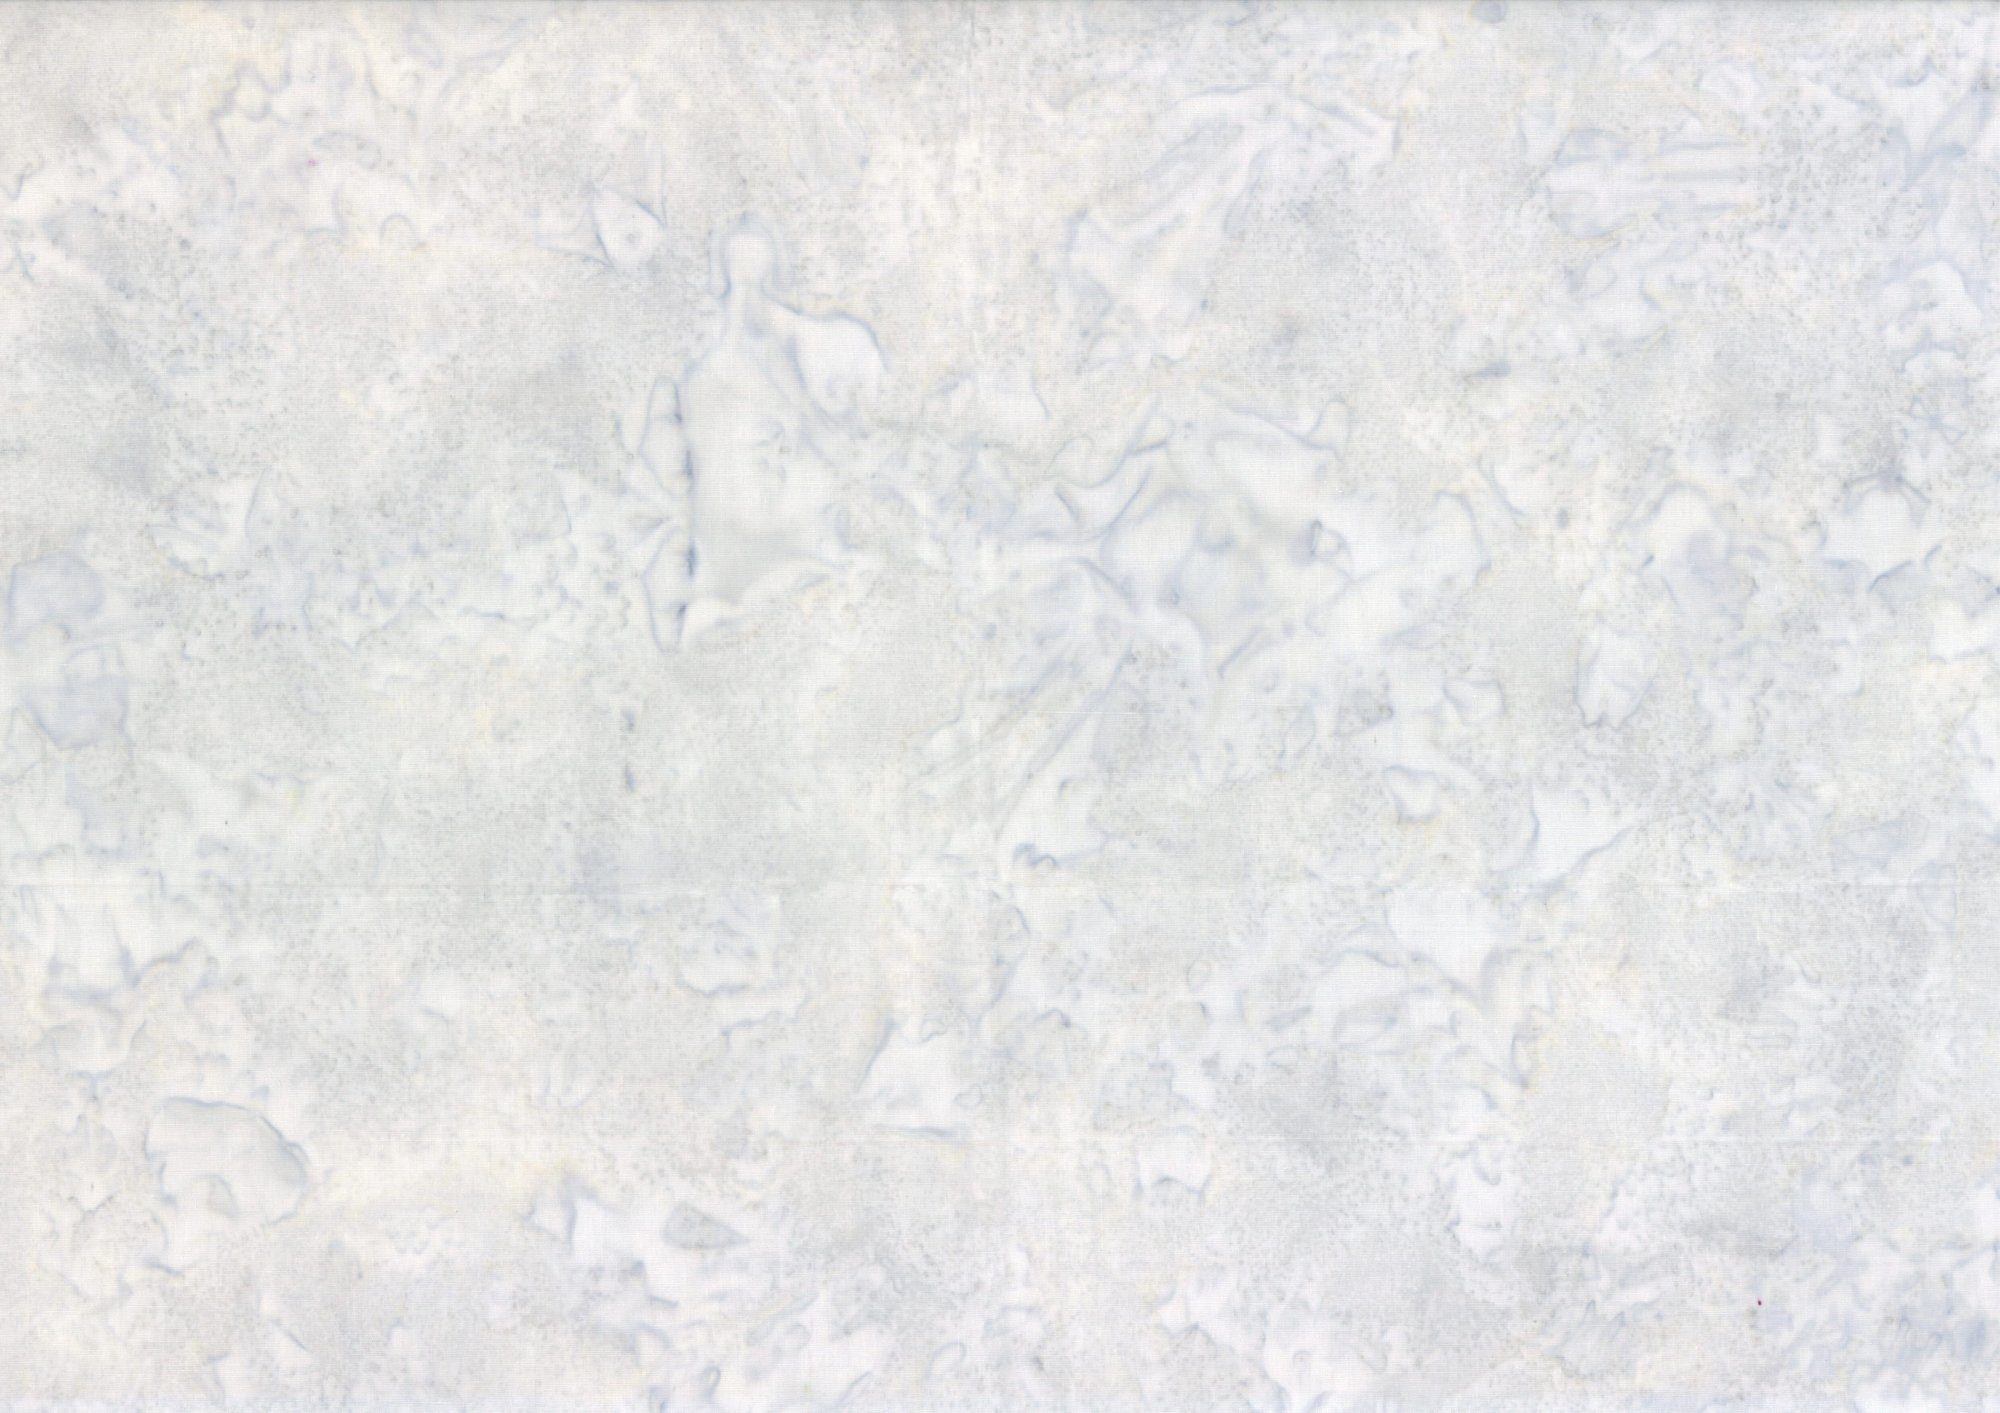 2678-900 Lt Gray Rock Candy Batik